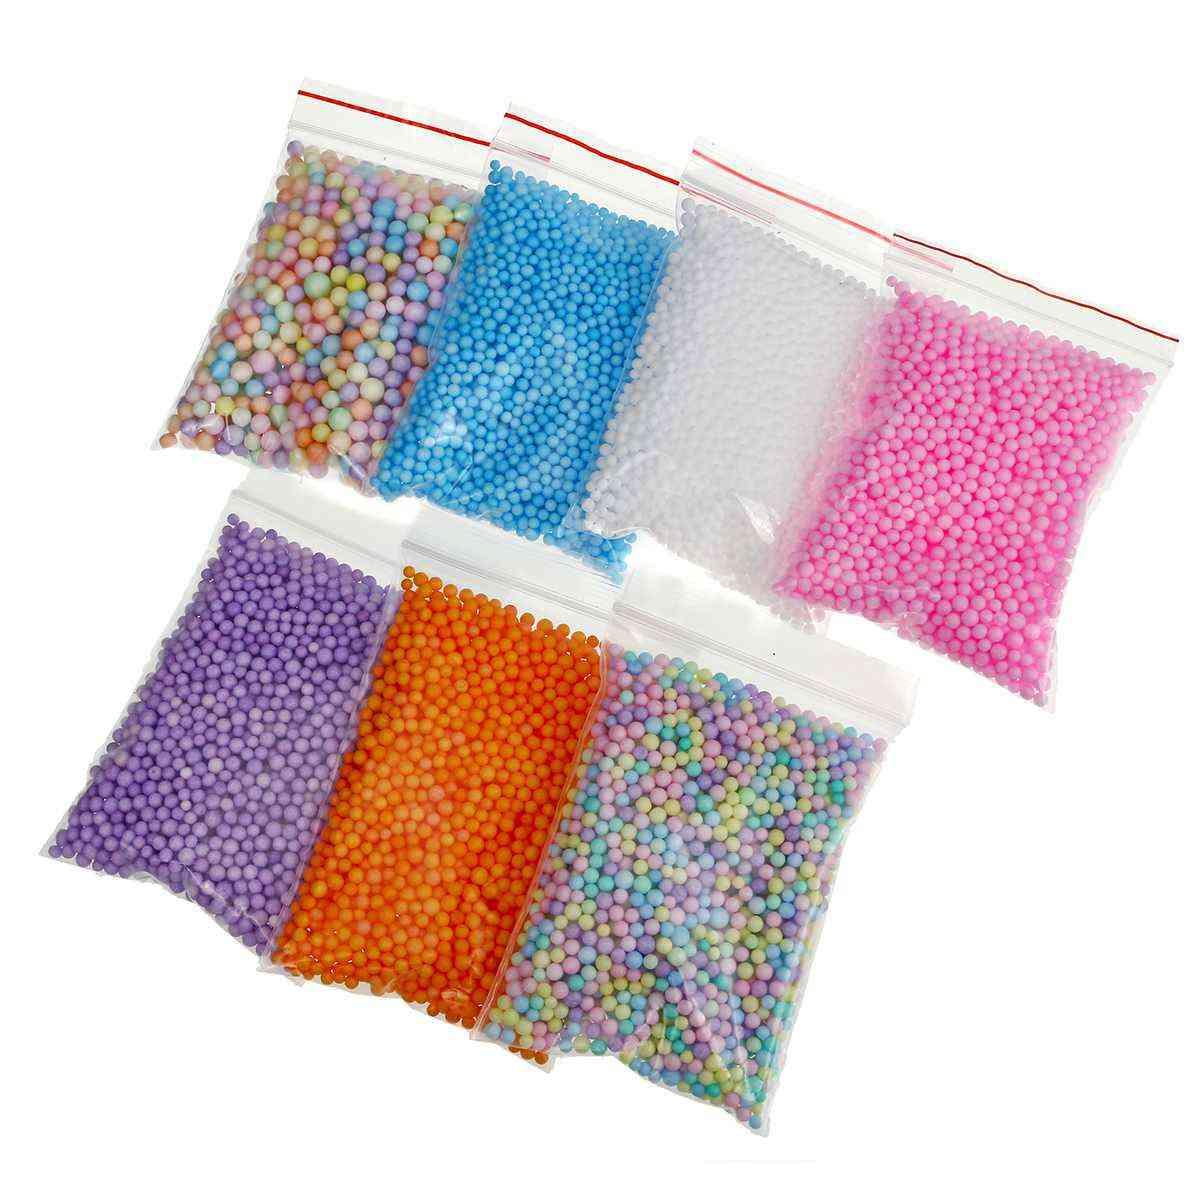 Slime Stuff, Charm Fishbowl Beads, Glitter Pearls Color, Foam Ball Set